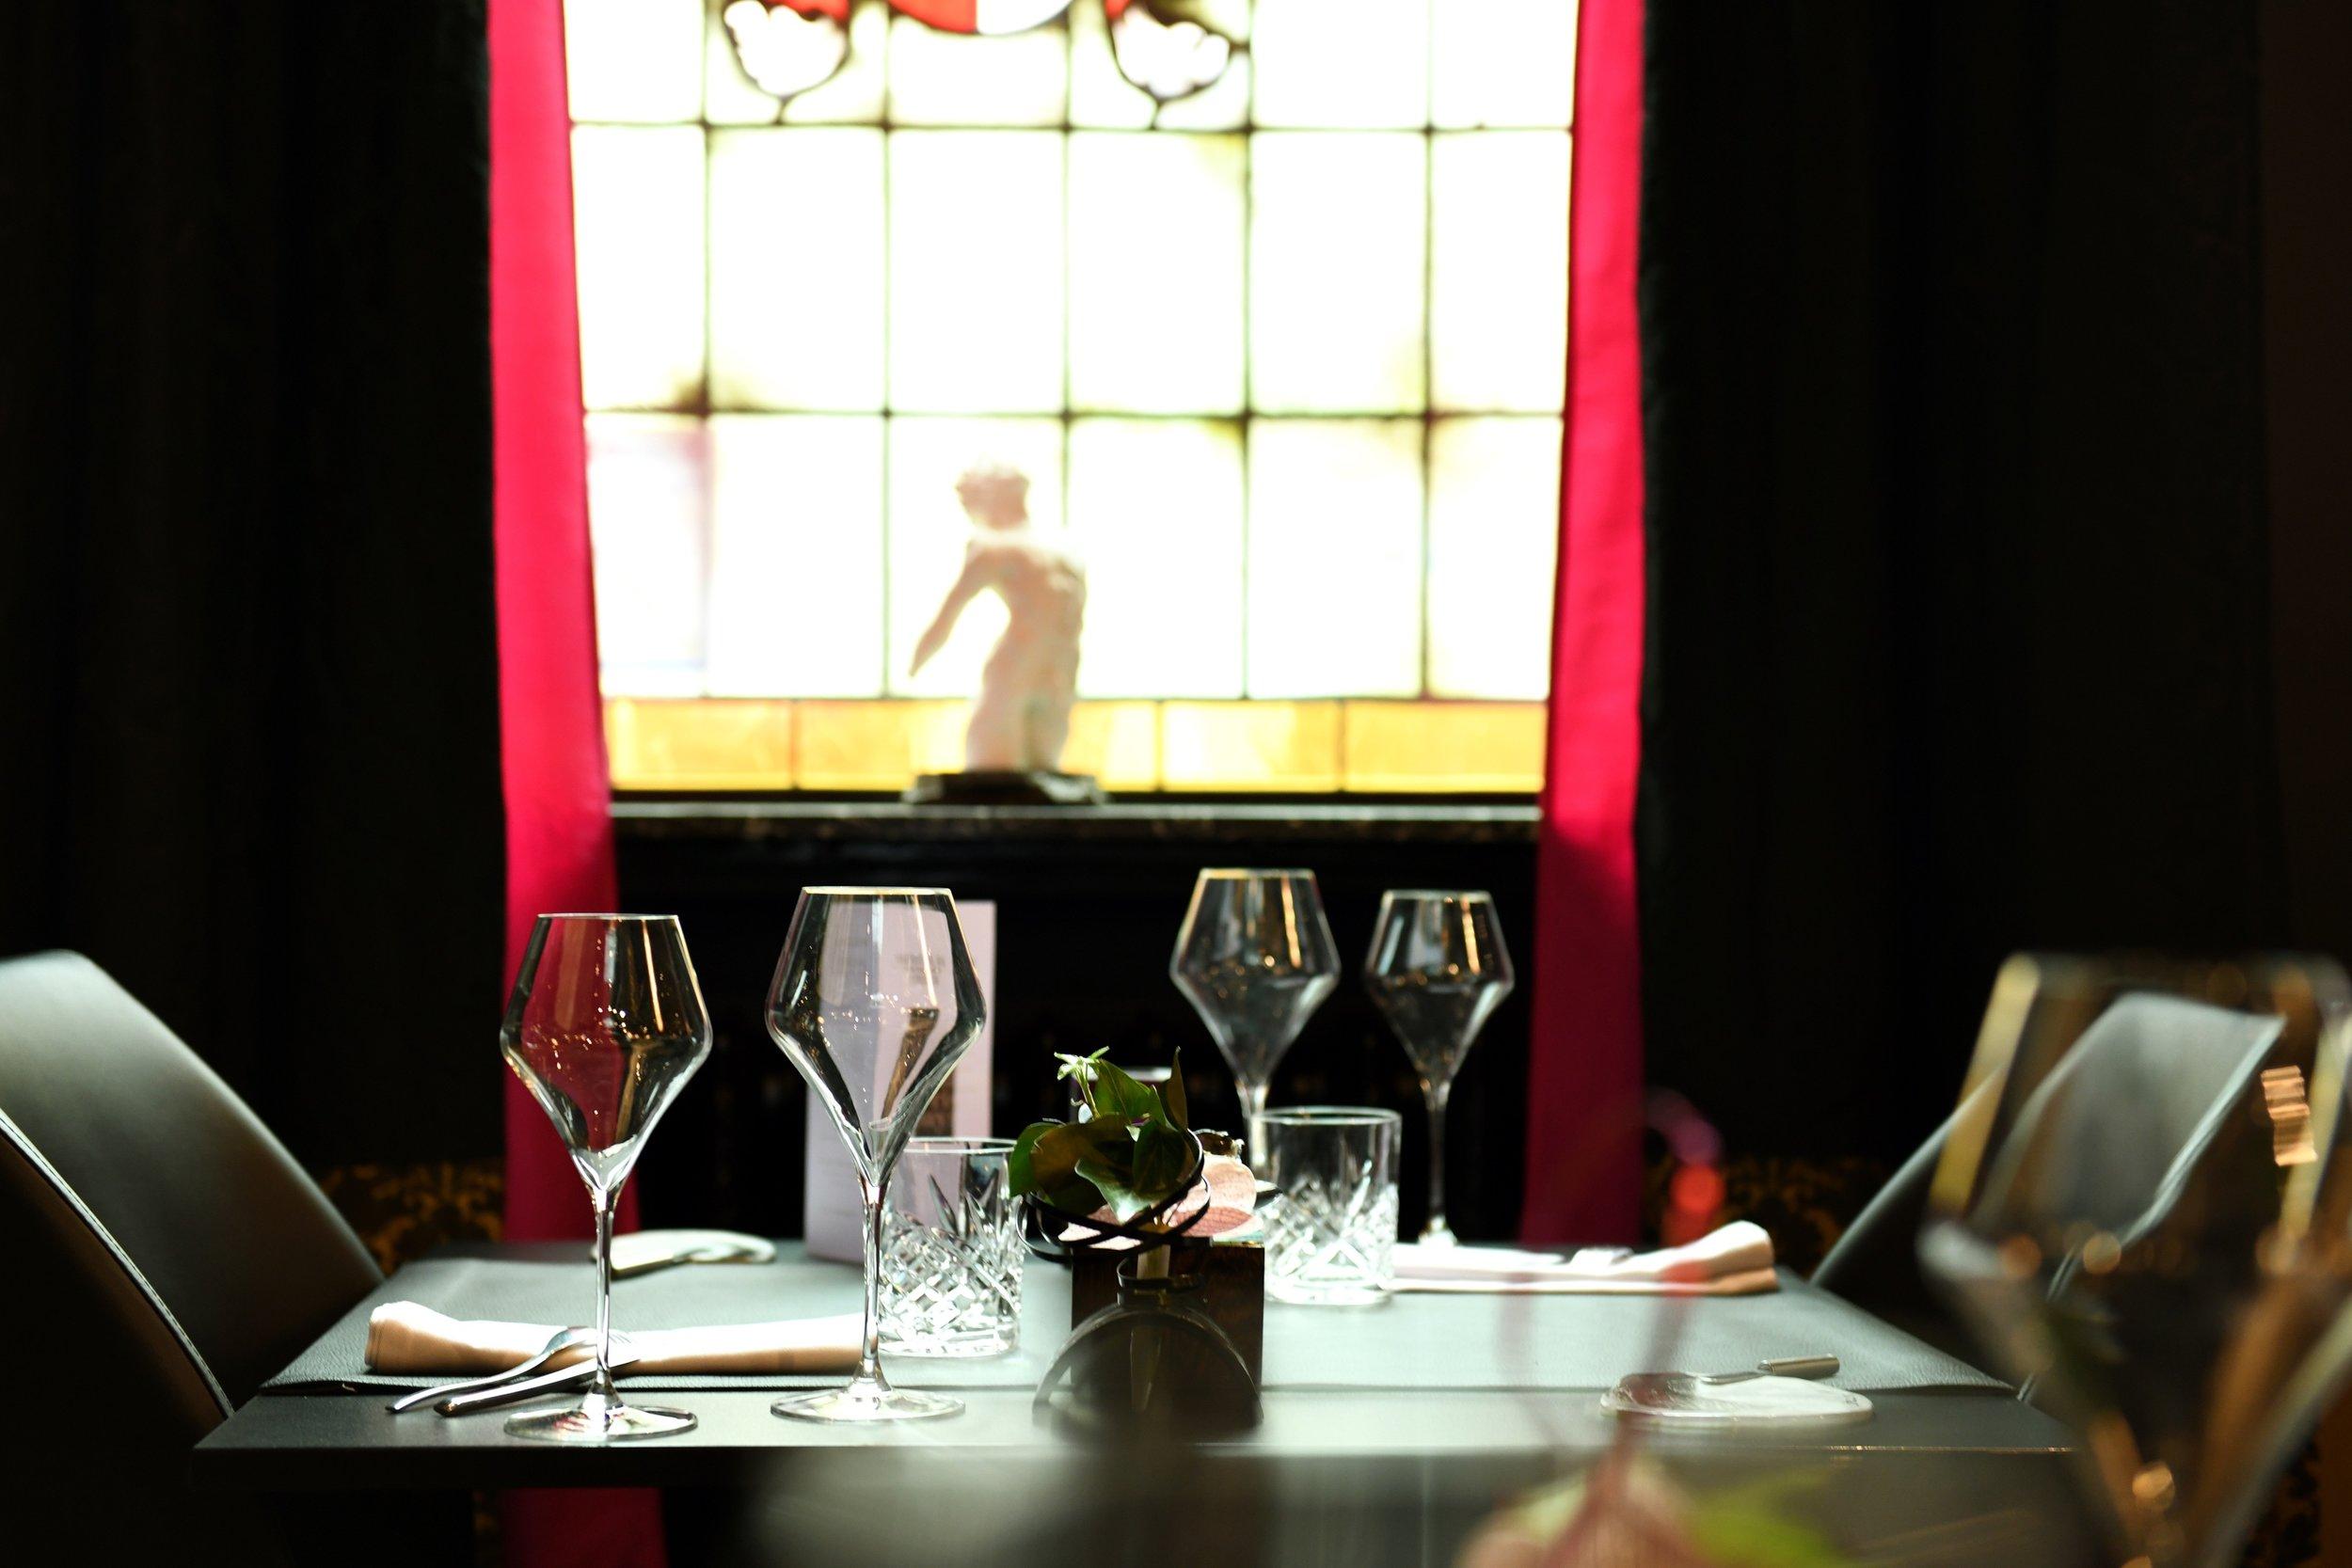 4 restaurant brasserie oud notarishuis ninove bart albrecht tablefever .jpg